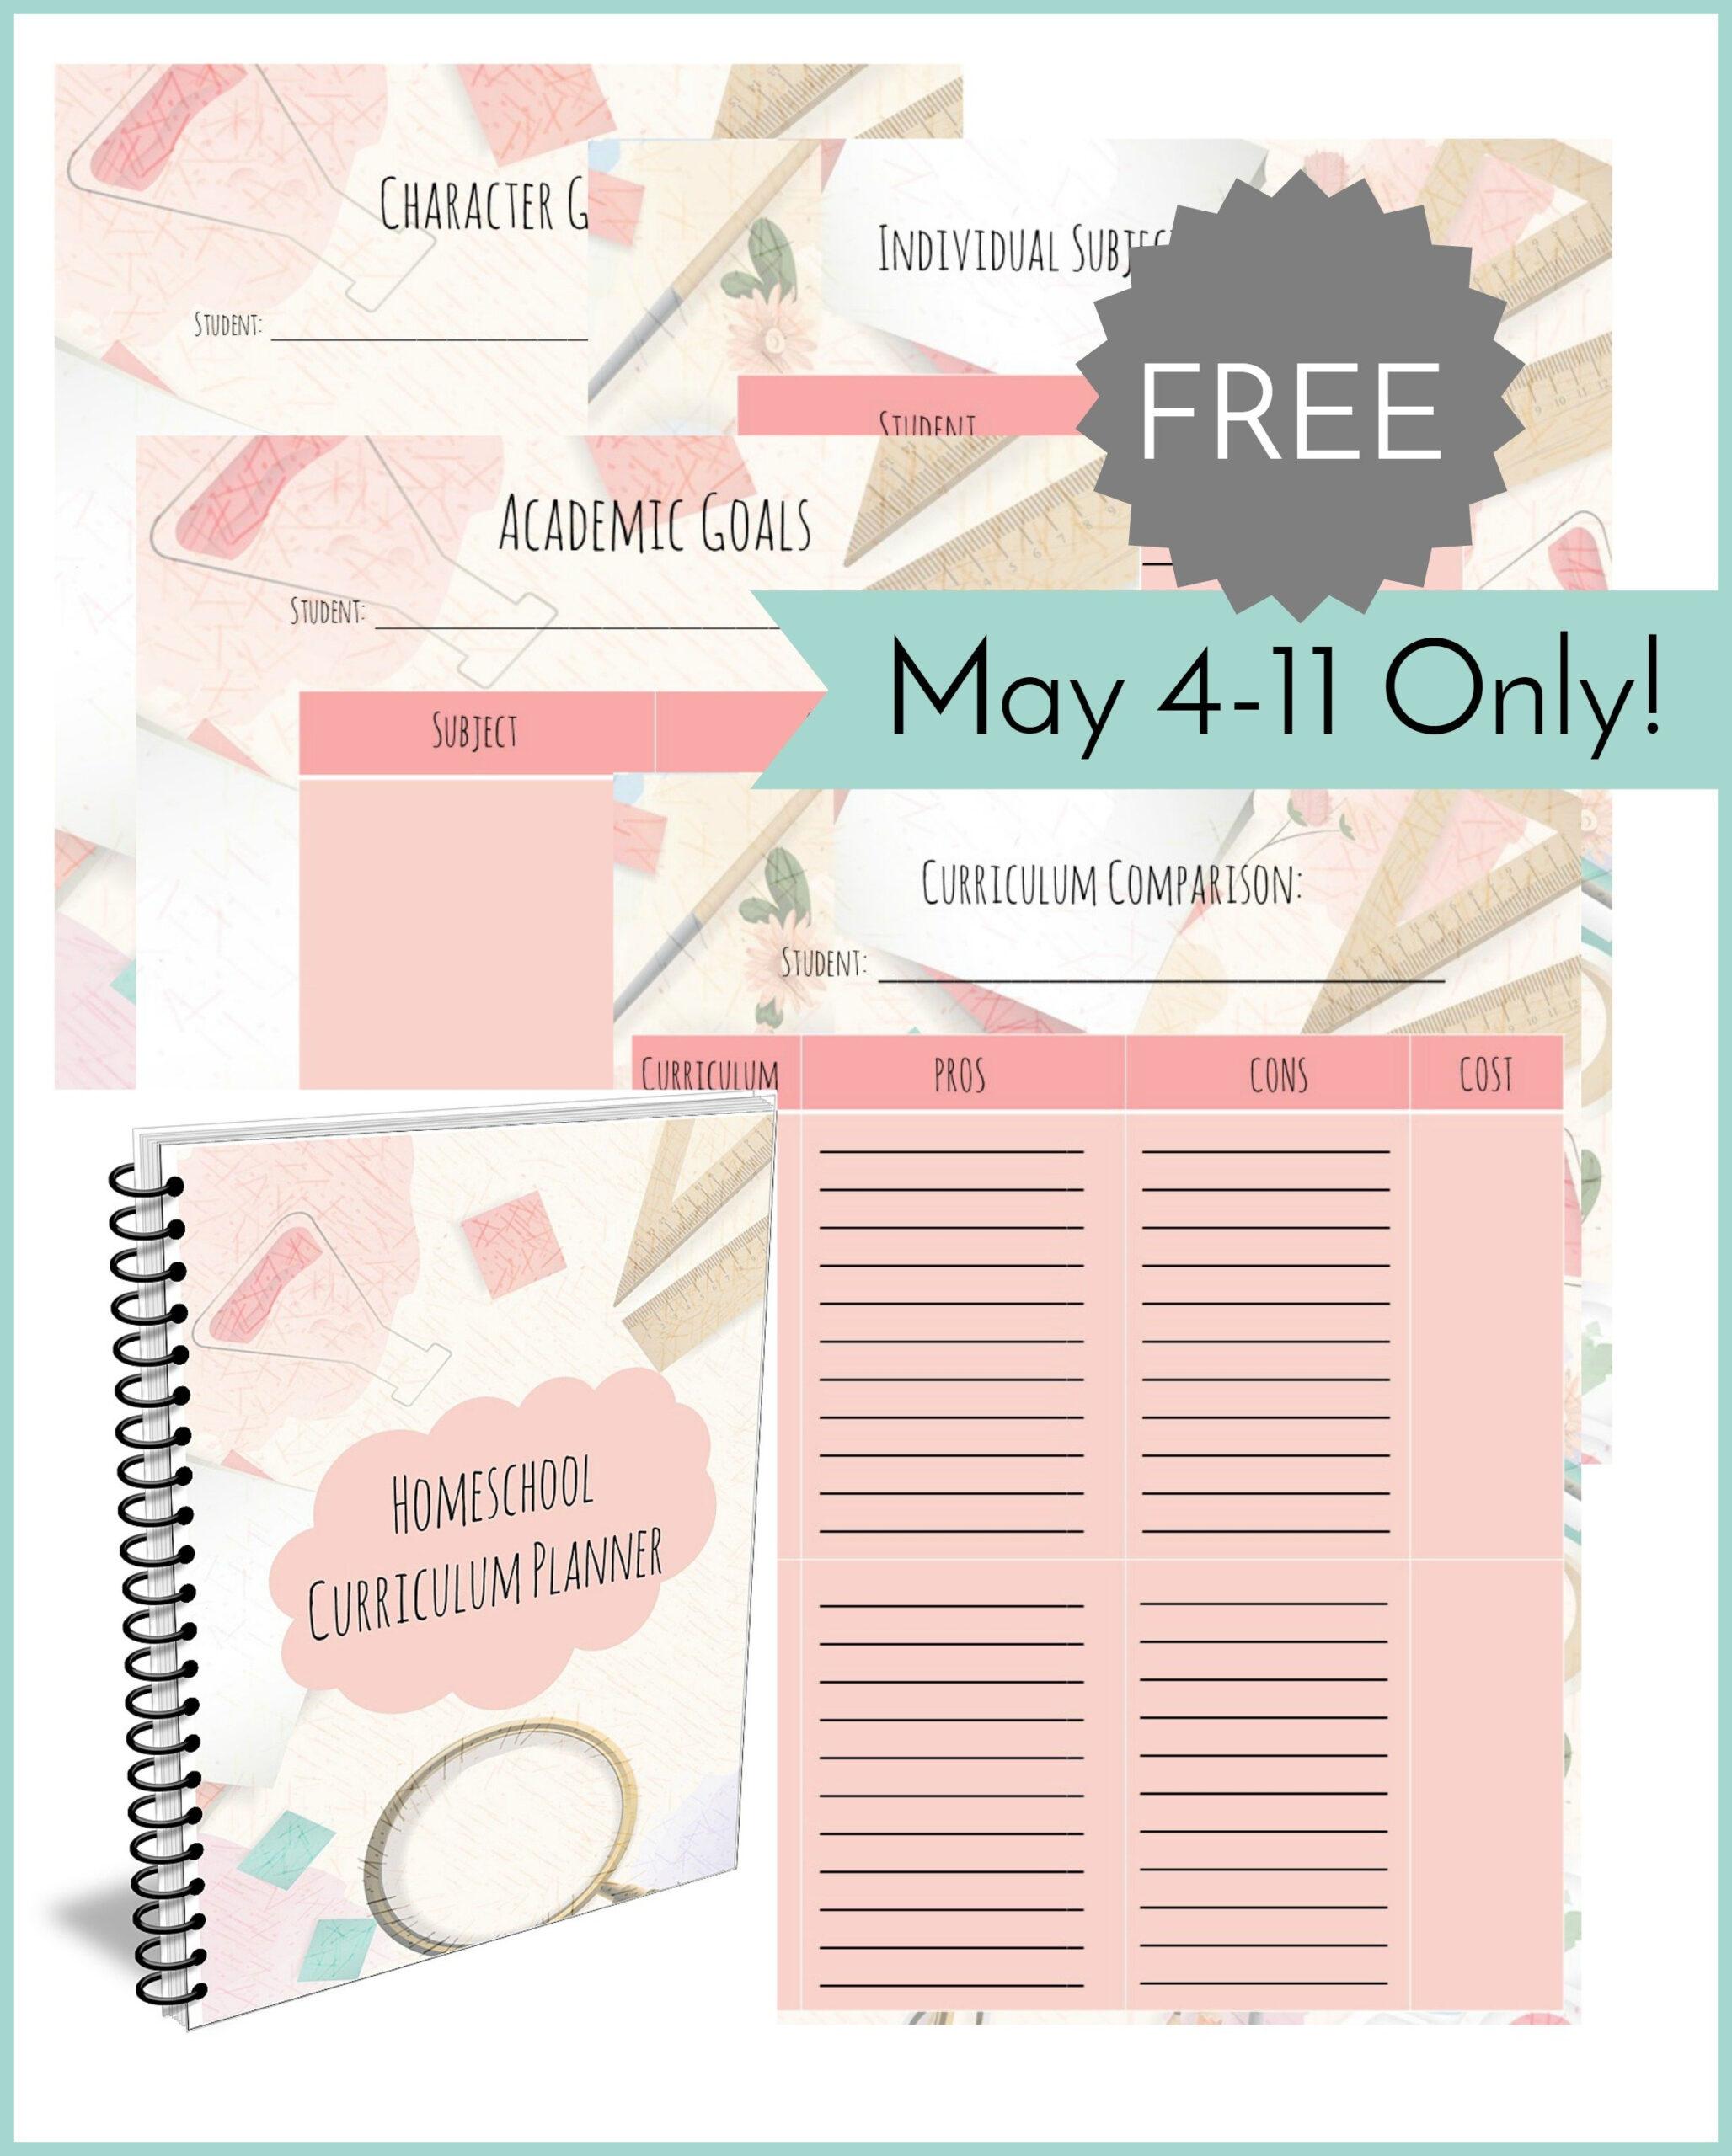 Free Homeschool Curriculum Planner   Free Homeschool Deals with regard to Free Printable Artist Planner Worksheet Image